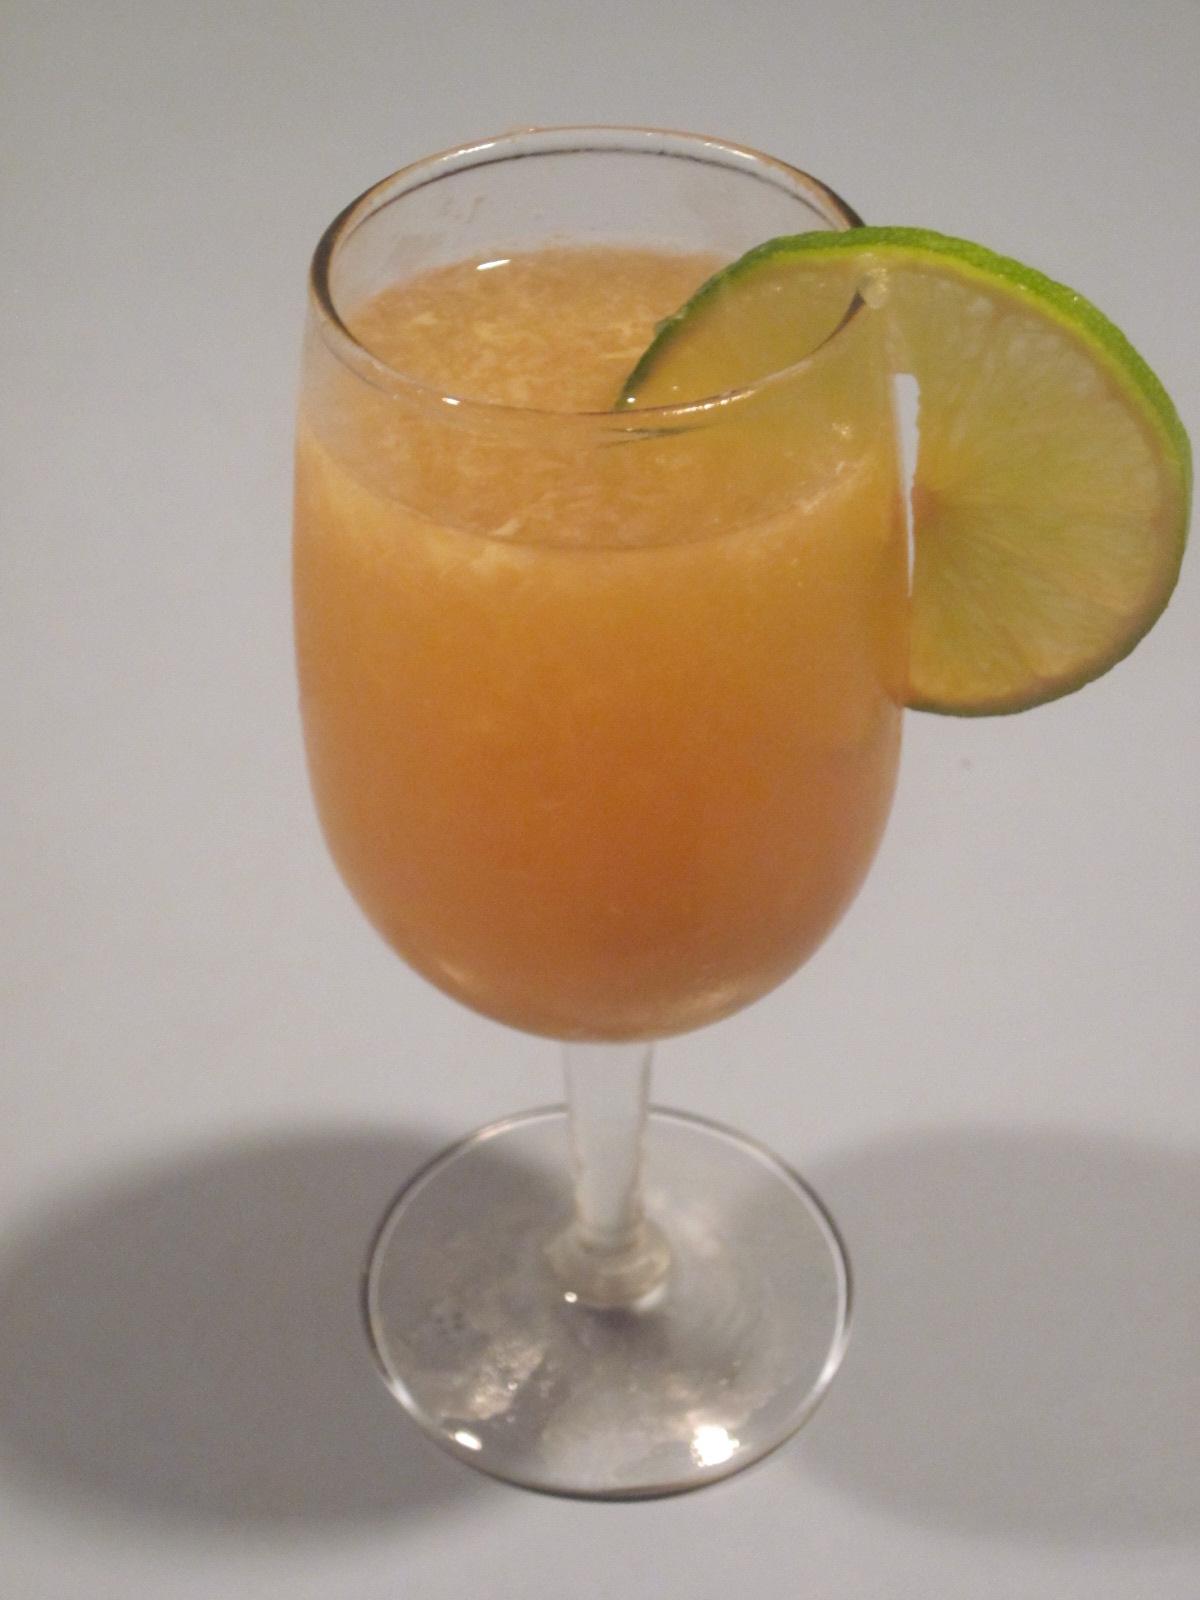 mix kumquat whiskey sour 2 oz whiskey sour storing kumquats kumquat ...